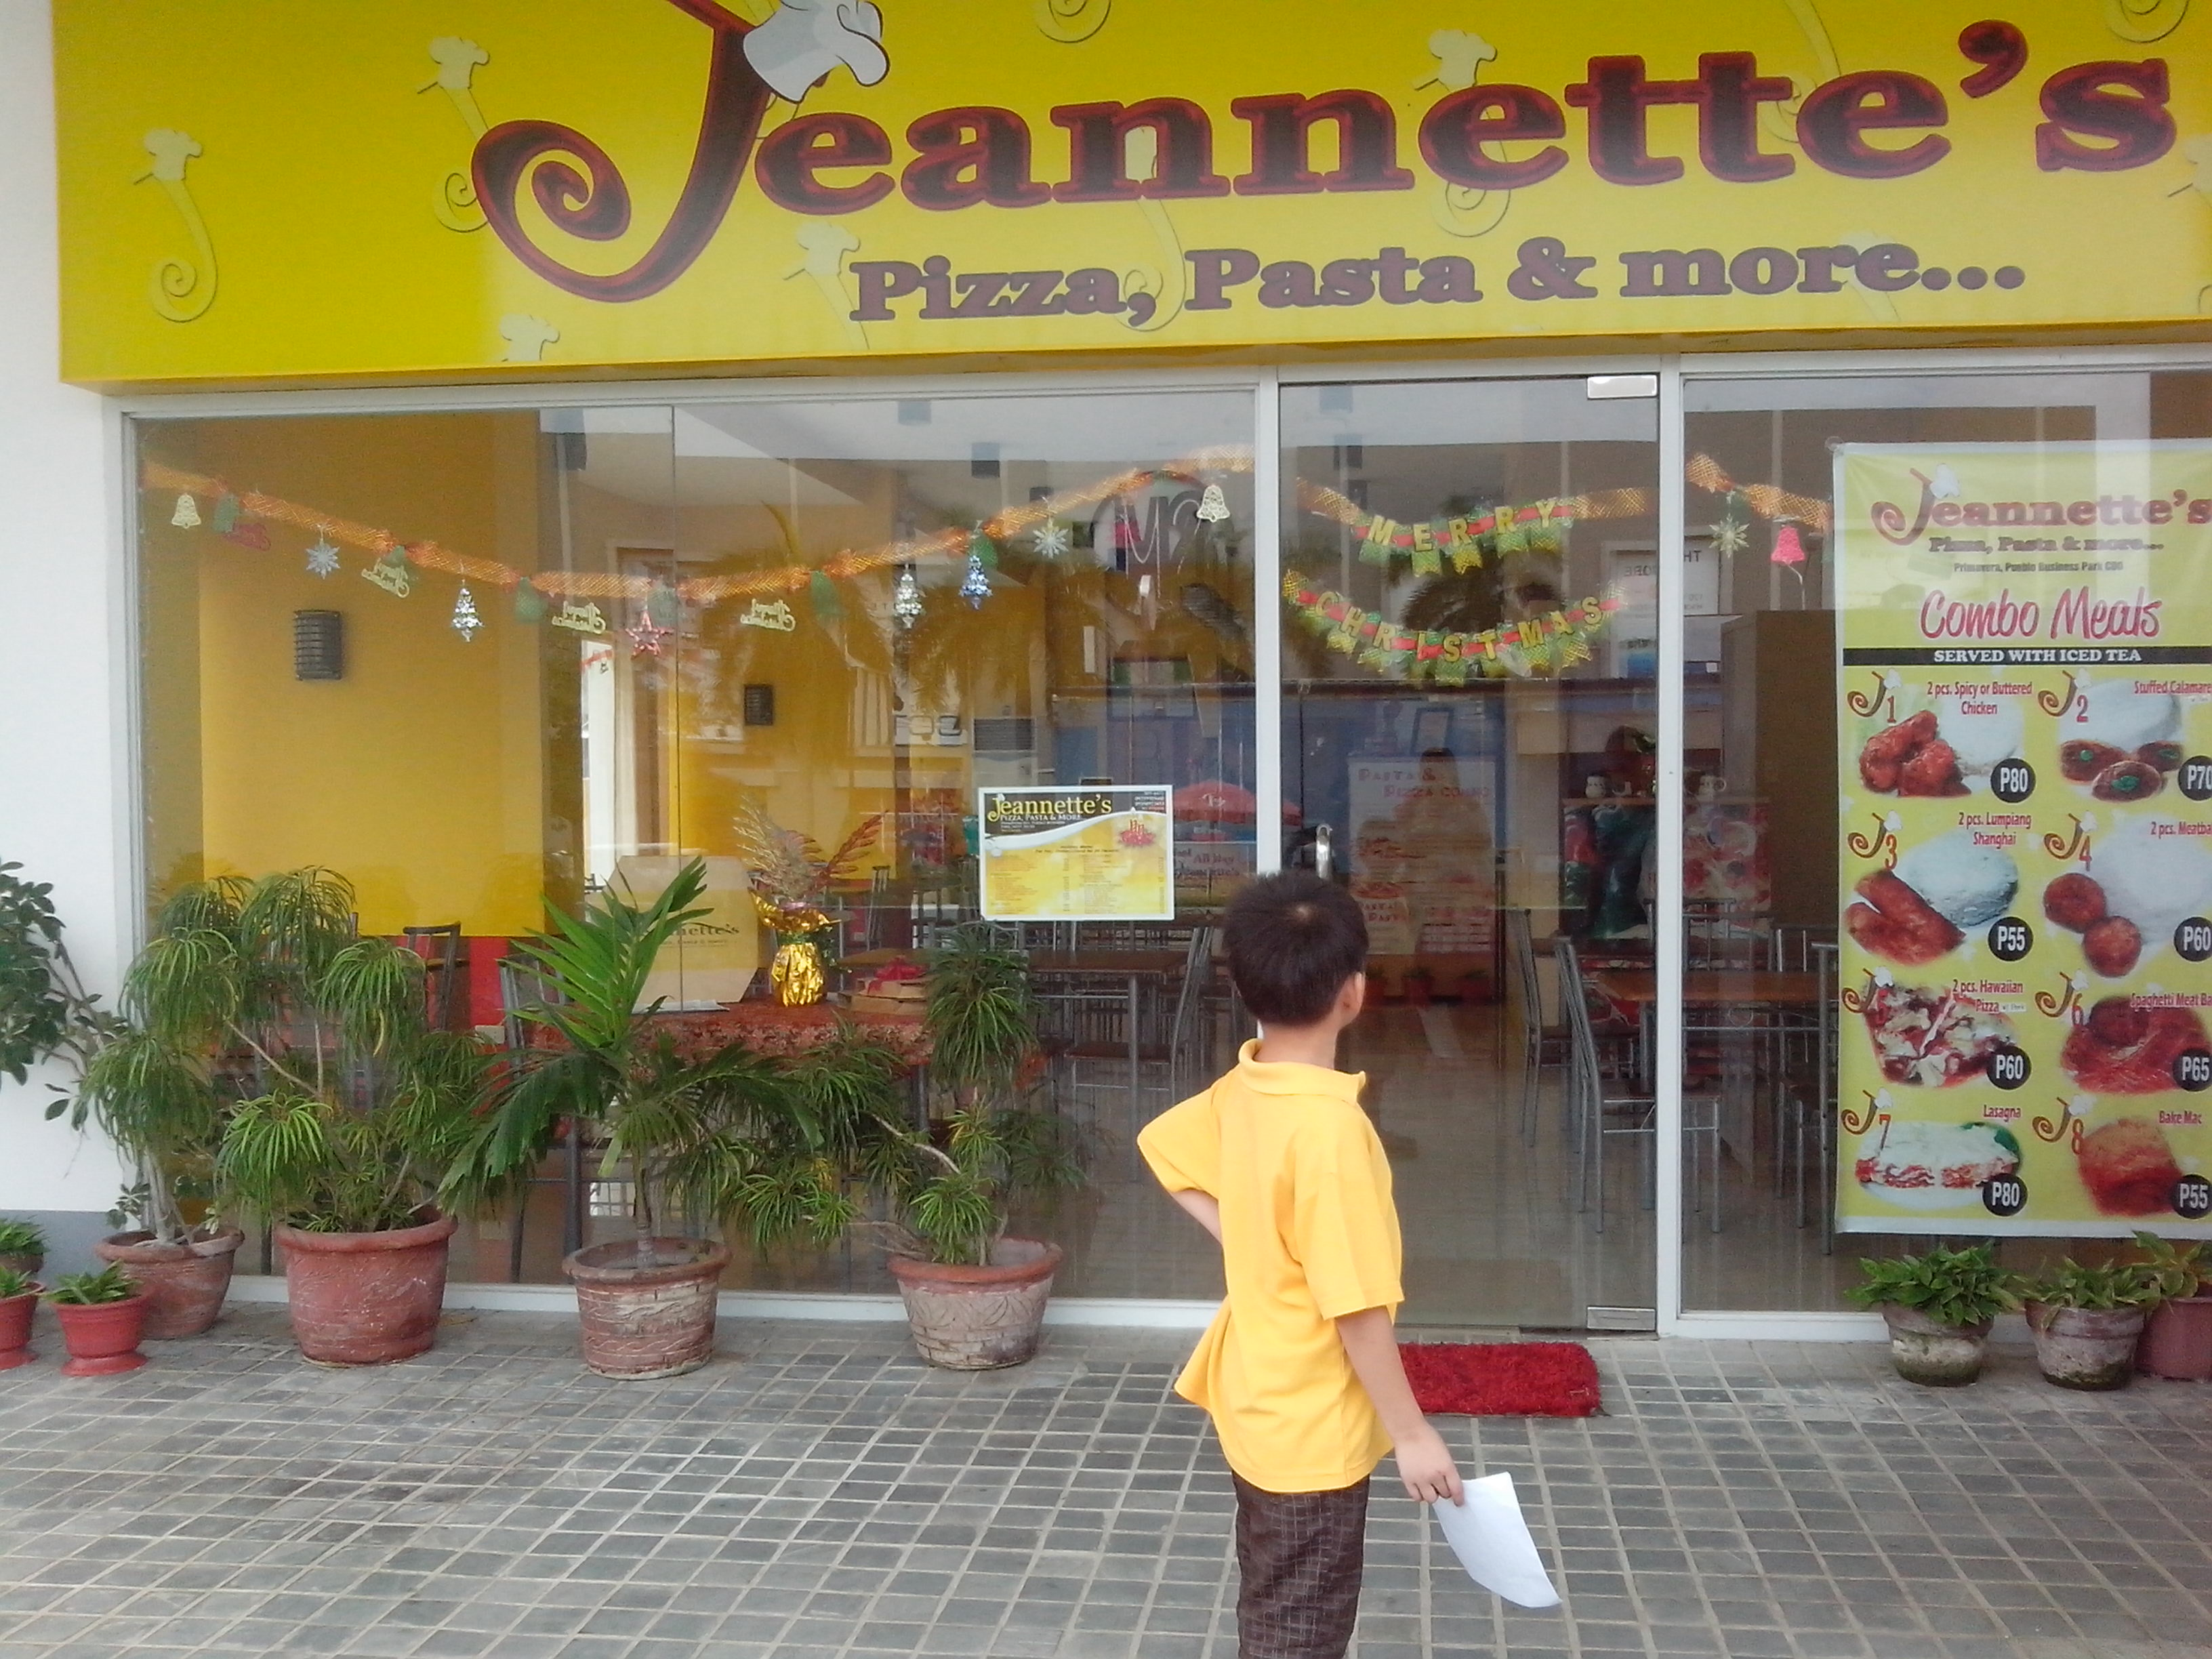 Jeanette's Pizza Restaurant | Primavera Residences | Uptown Cagayan de Oro